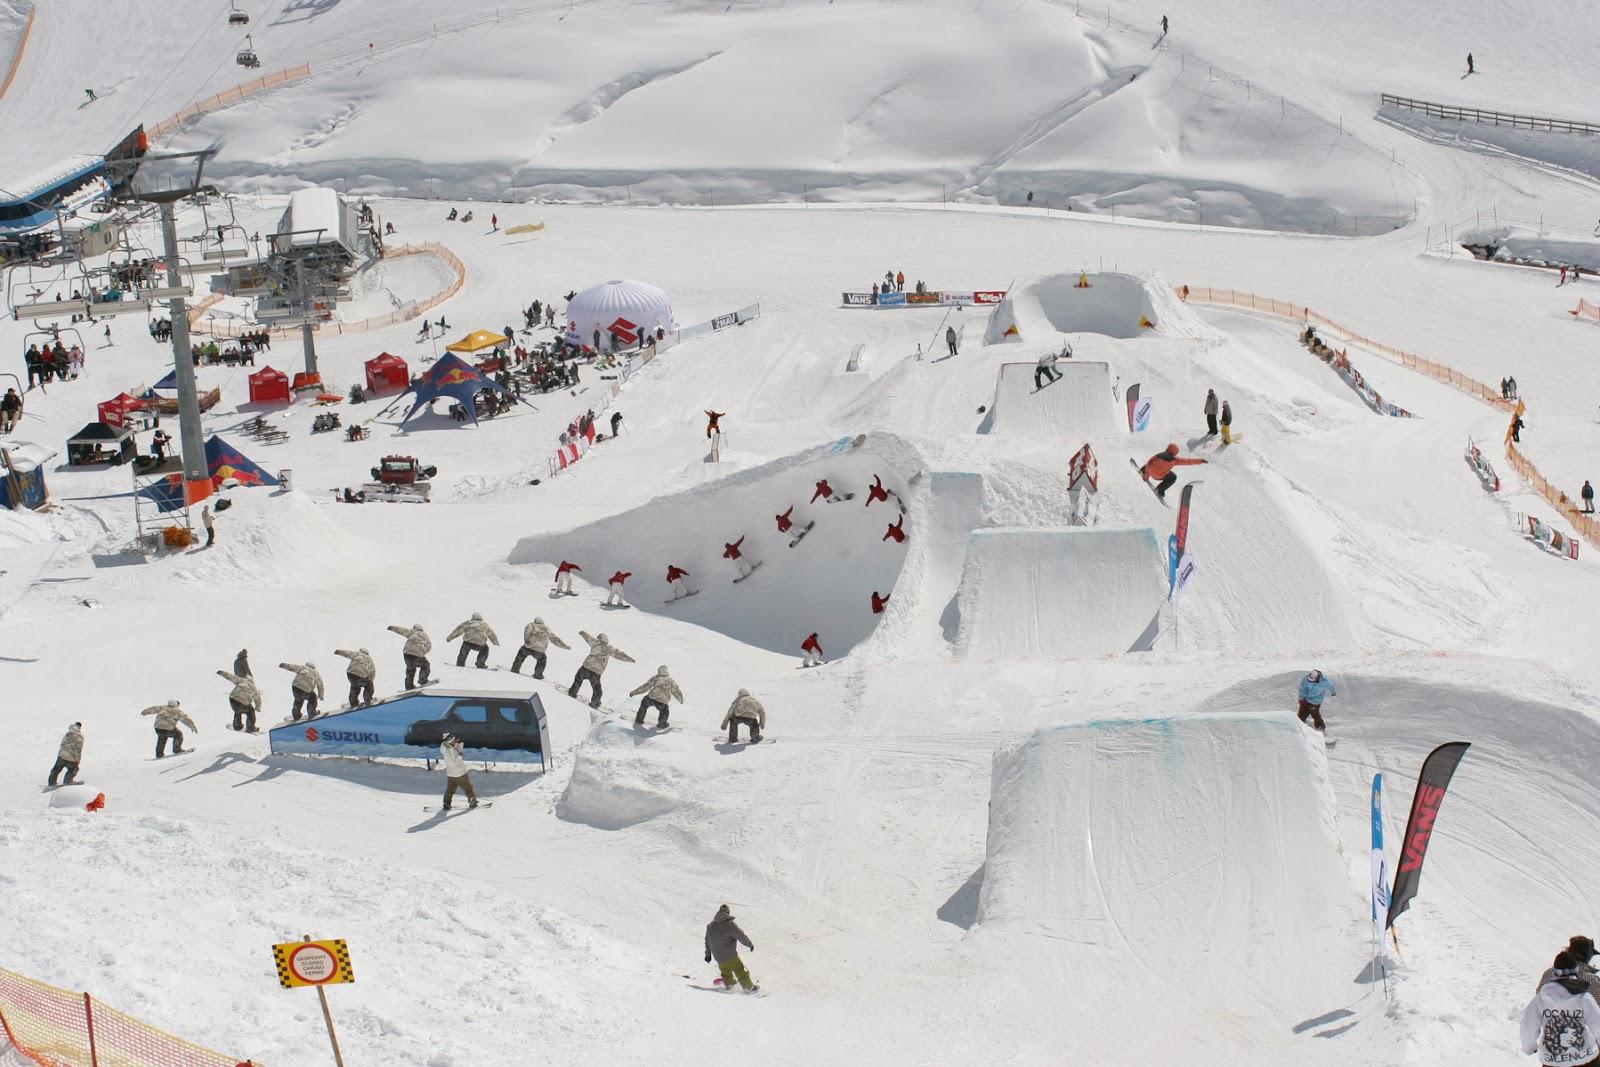 Mayrhofen, Austria - Top 10 Snow Parks in The World